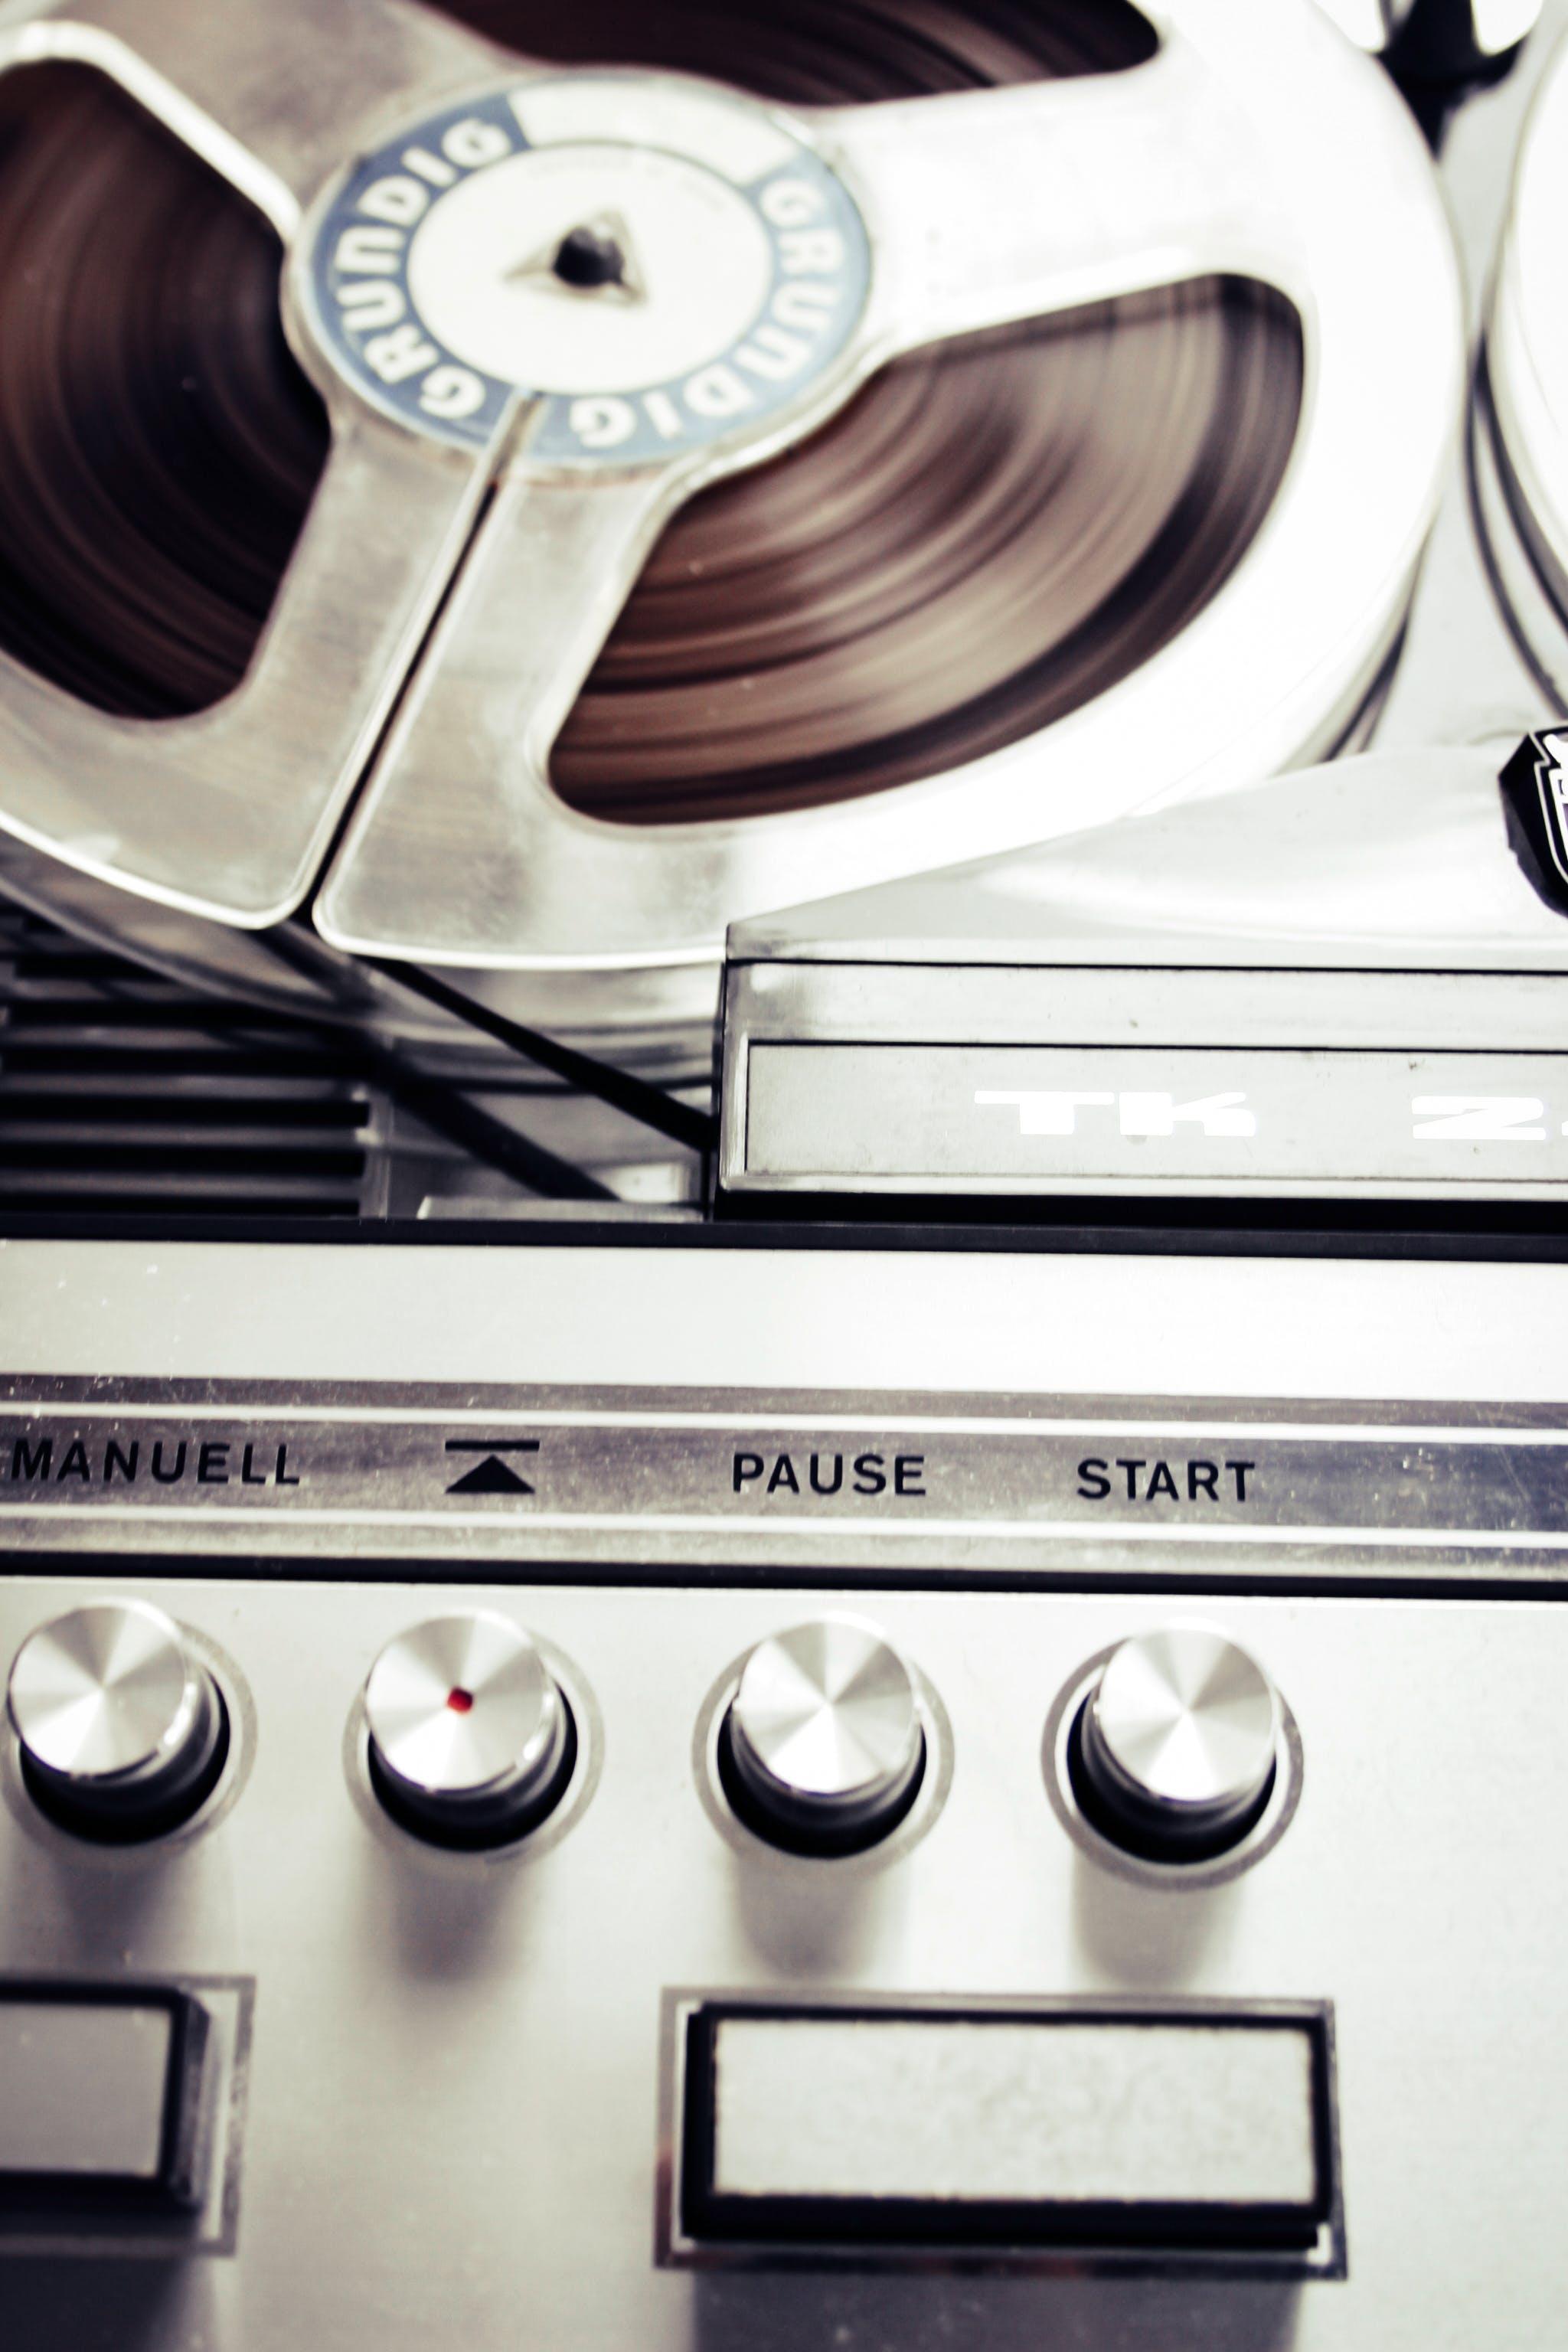 Kostenloses Stock Foto zu klang, plattenspieler, recorder, retro